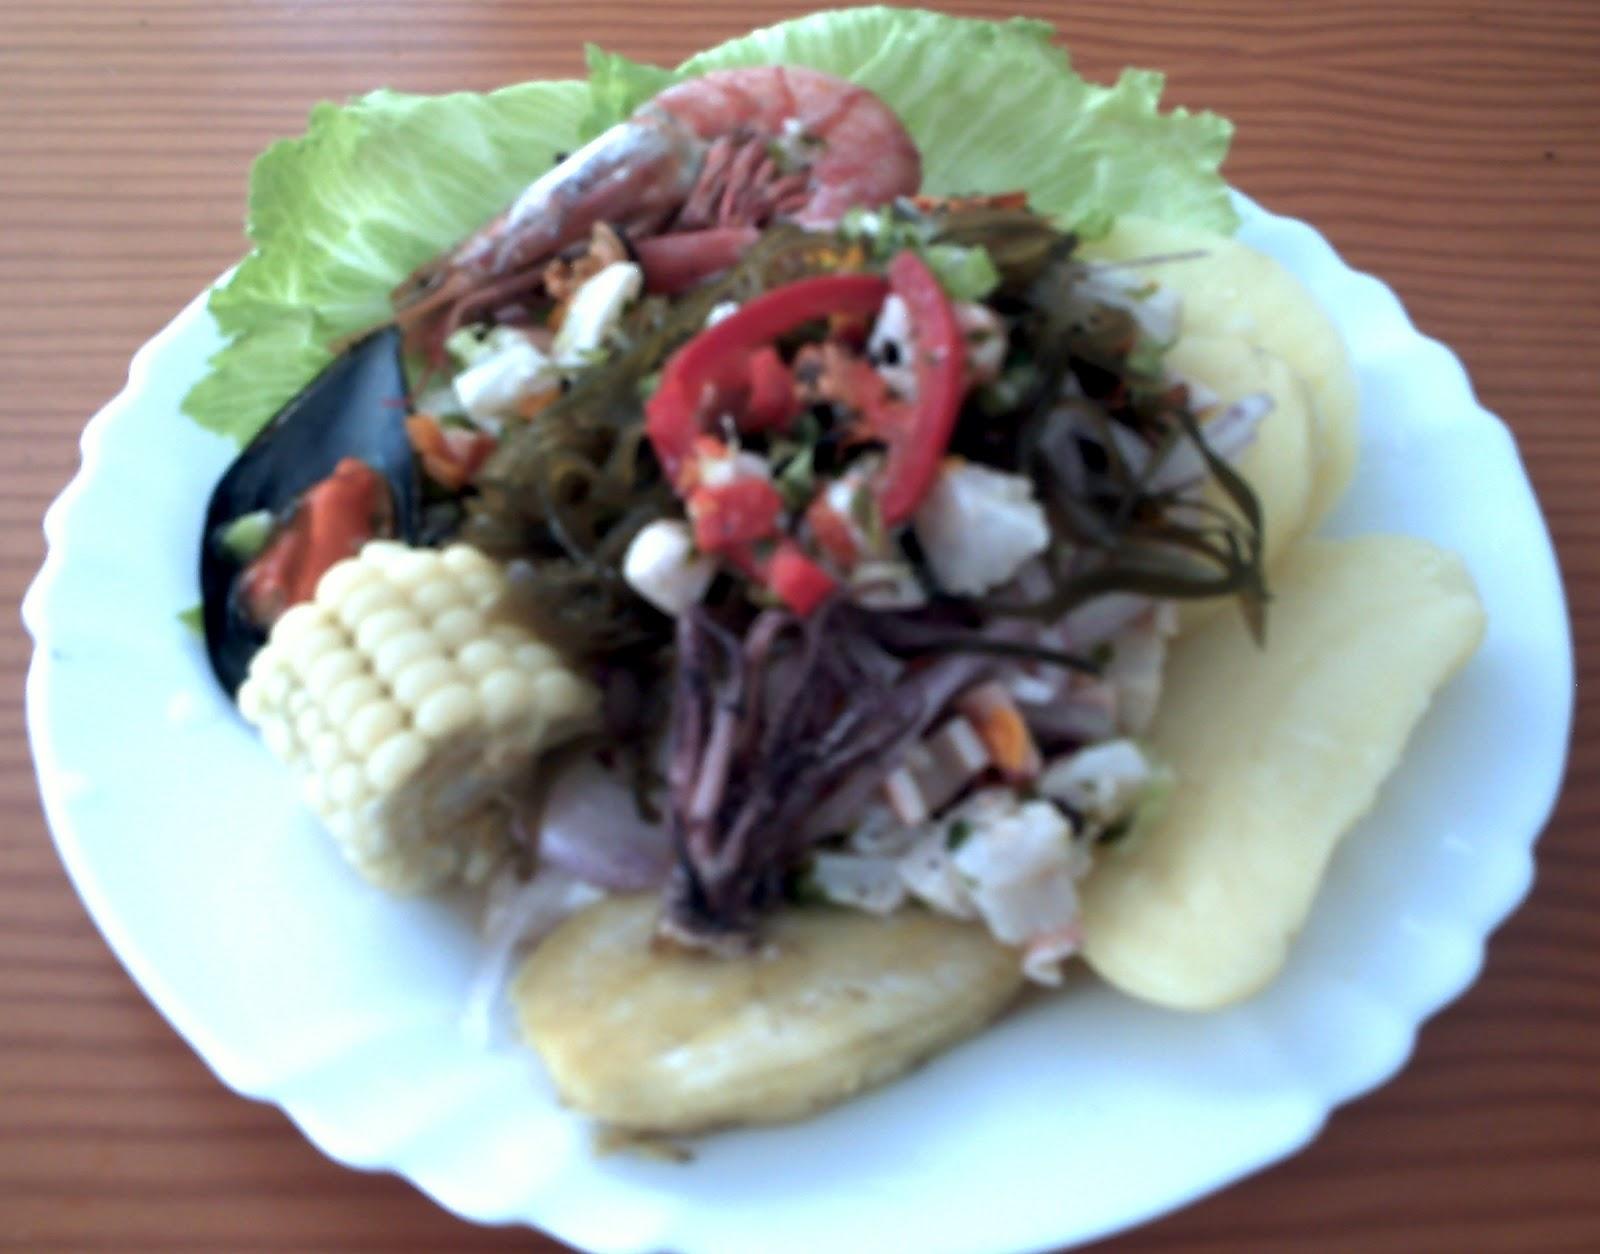 Comida Peruana E Internacional Receta Ceviche Peruano Mixto